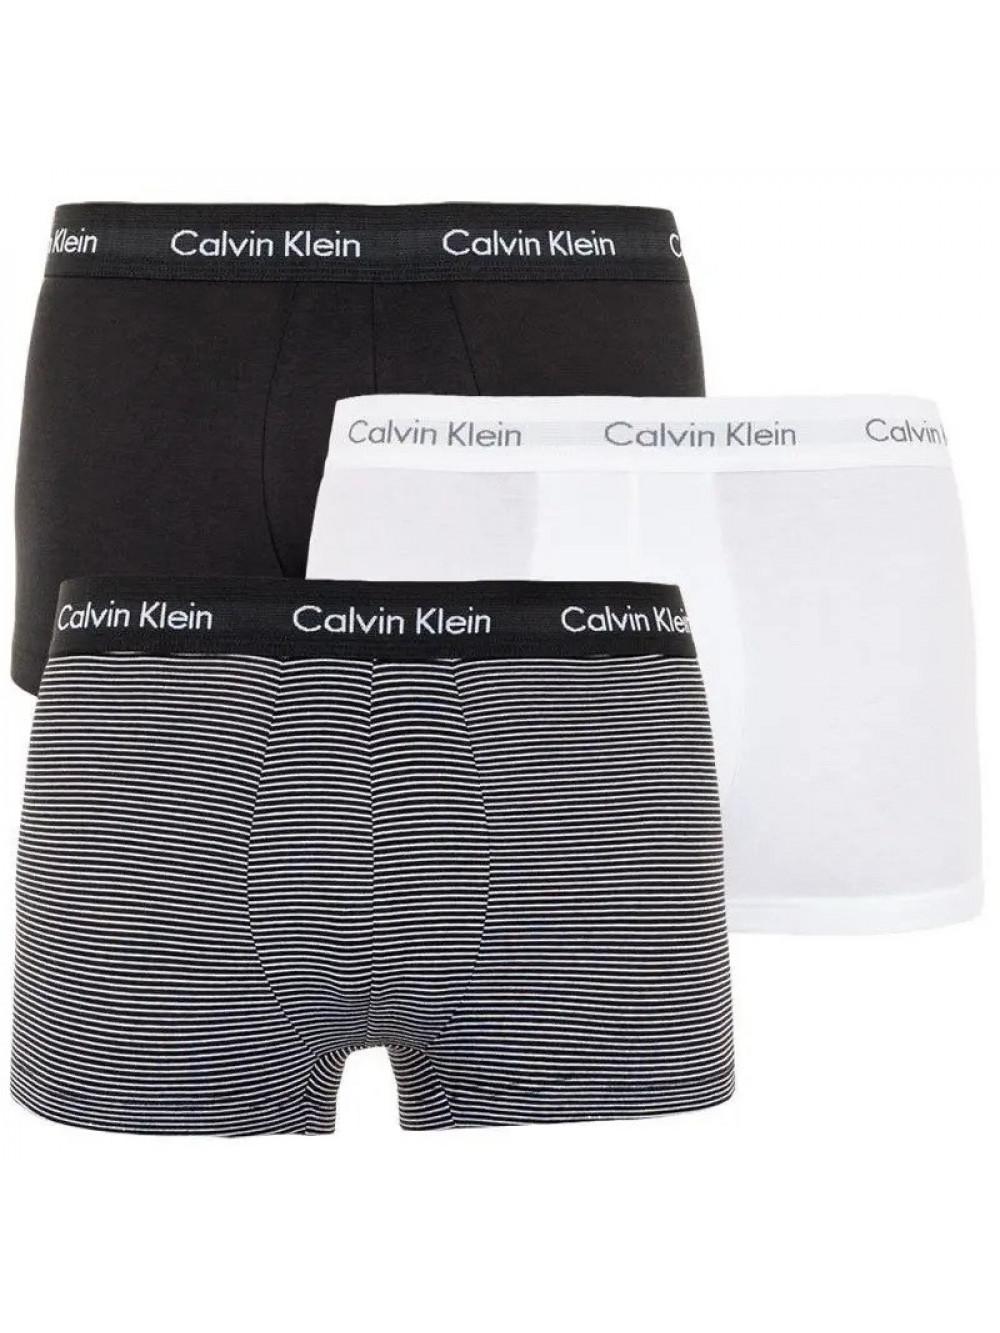 Pánské boxerky Calvin Klein Low Rise 3-pack